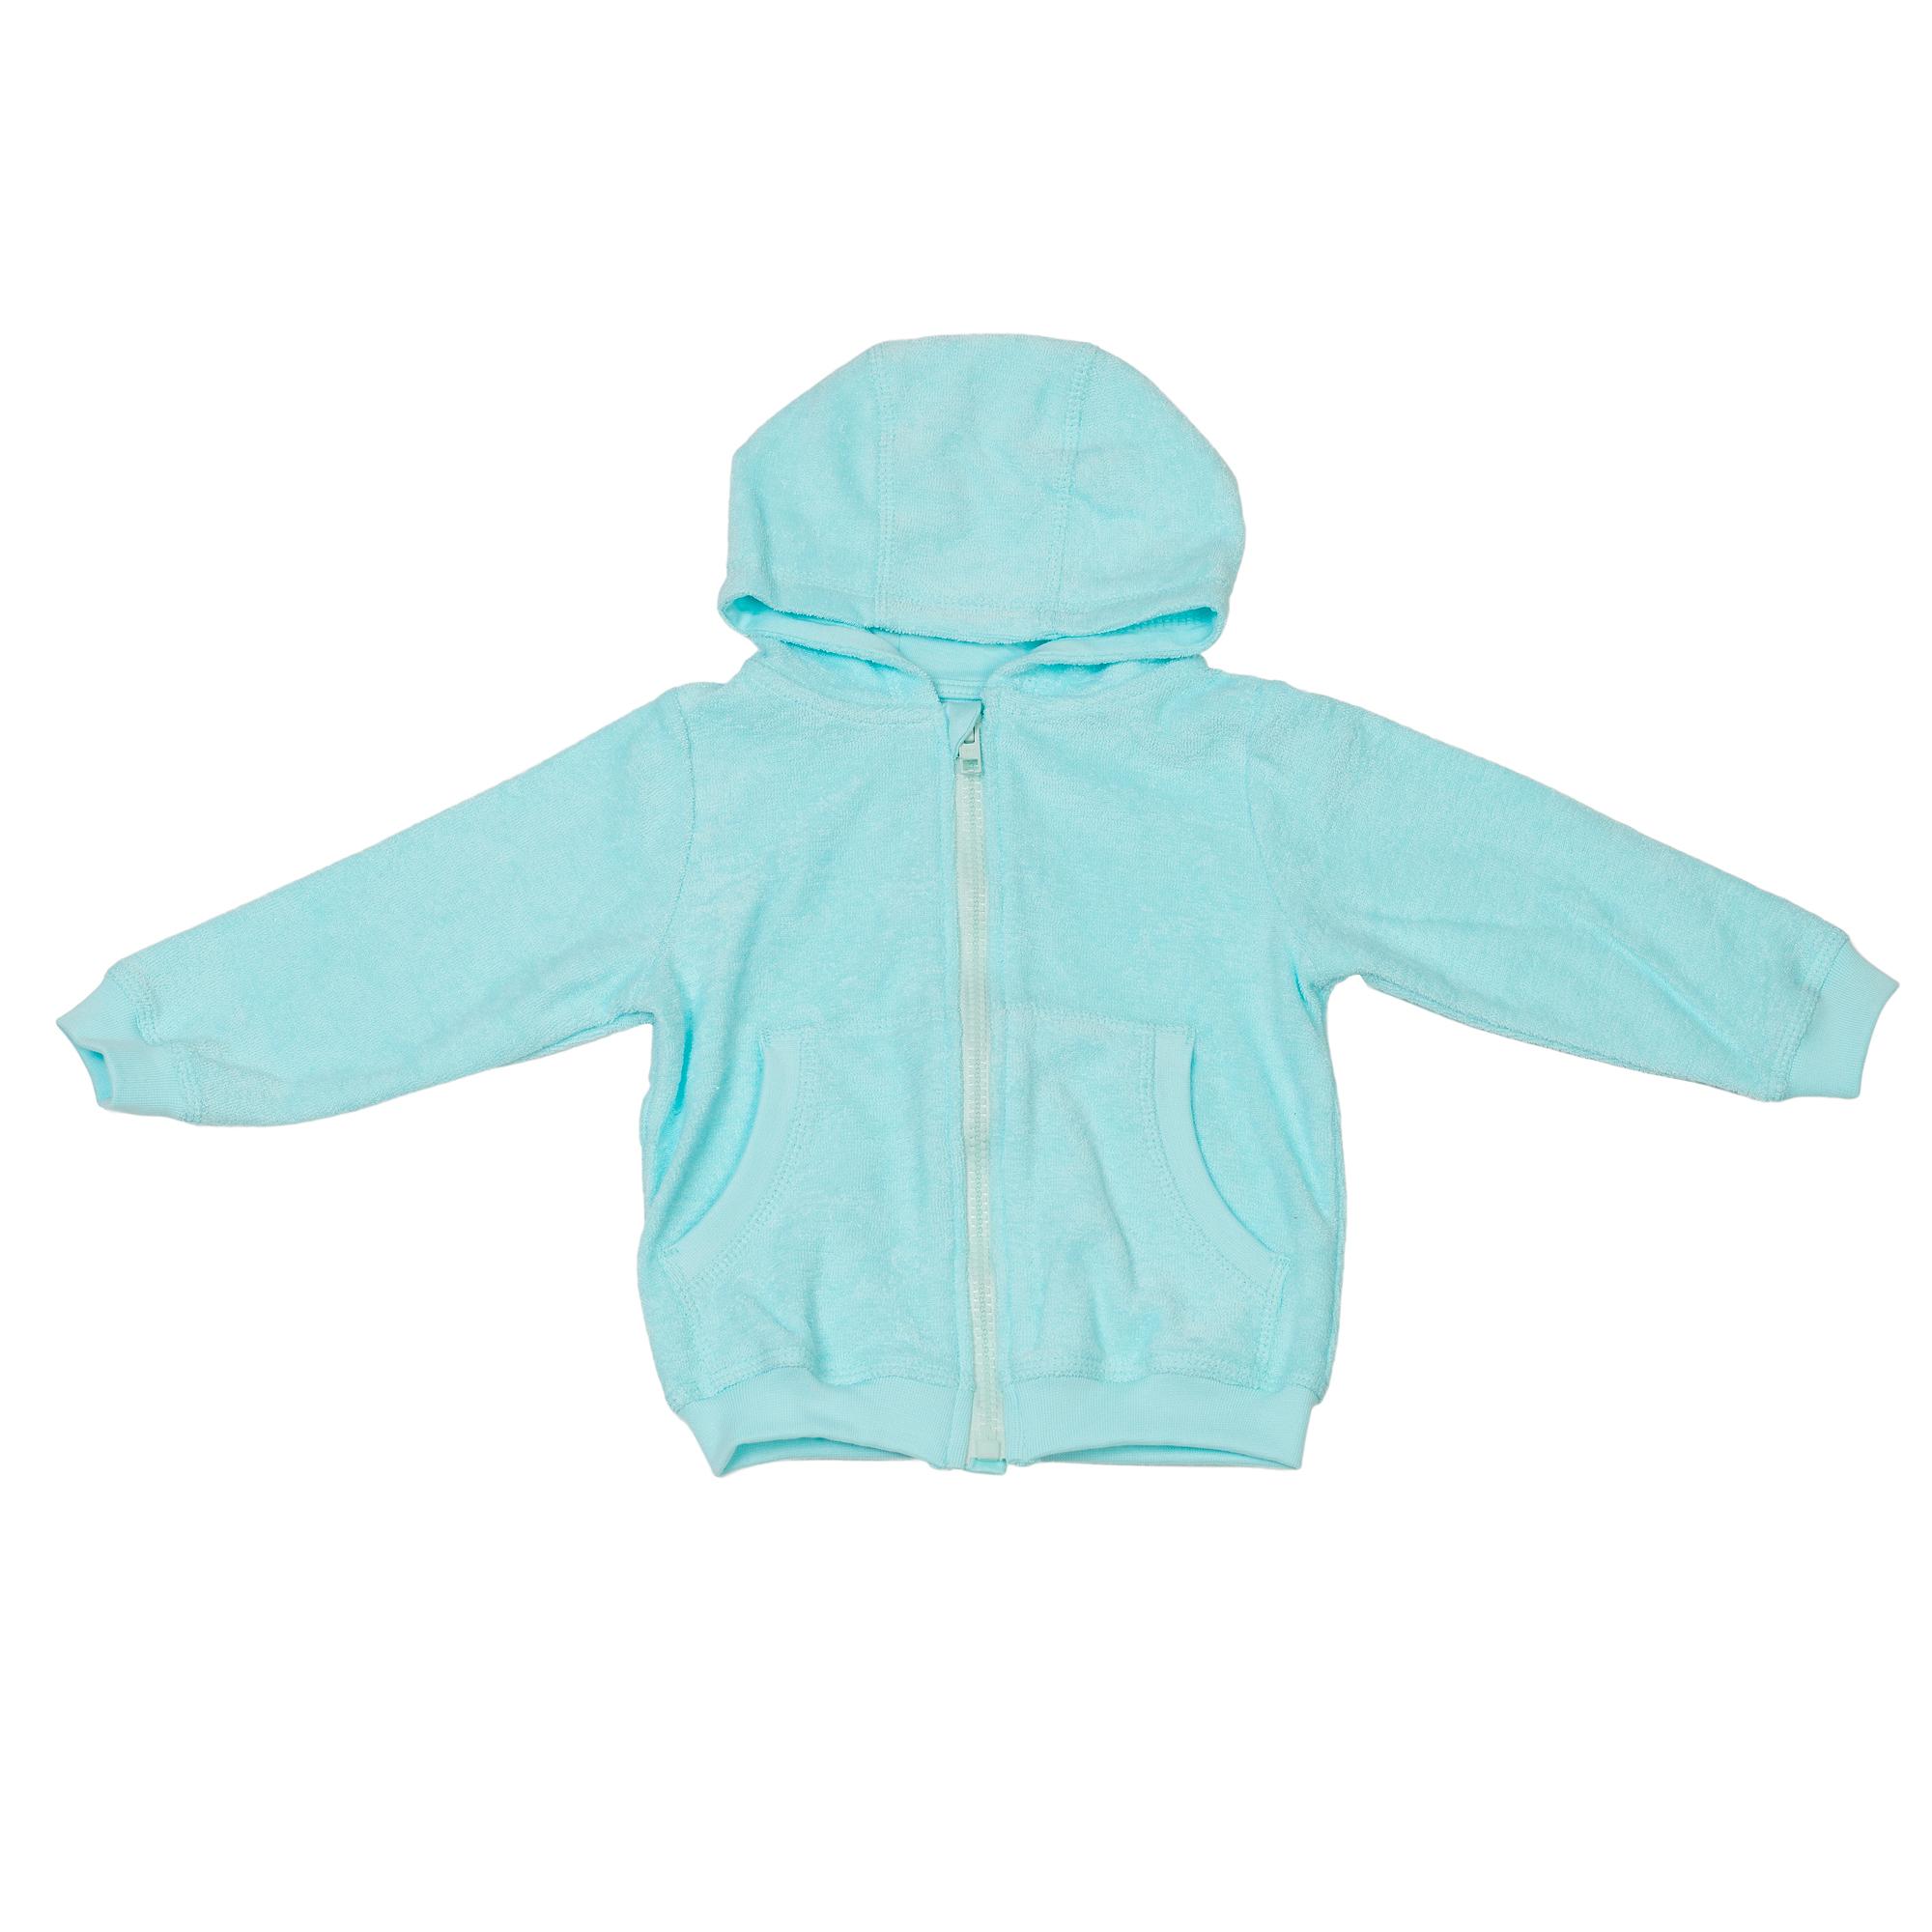 Baby Hooded Jacket Organic Cotton Turquoise